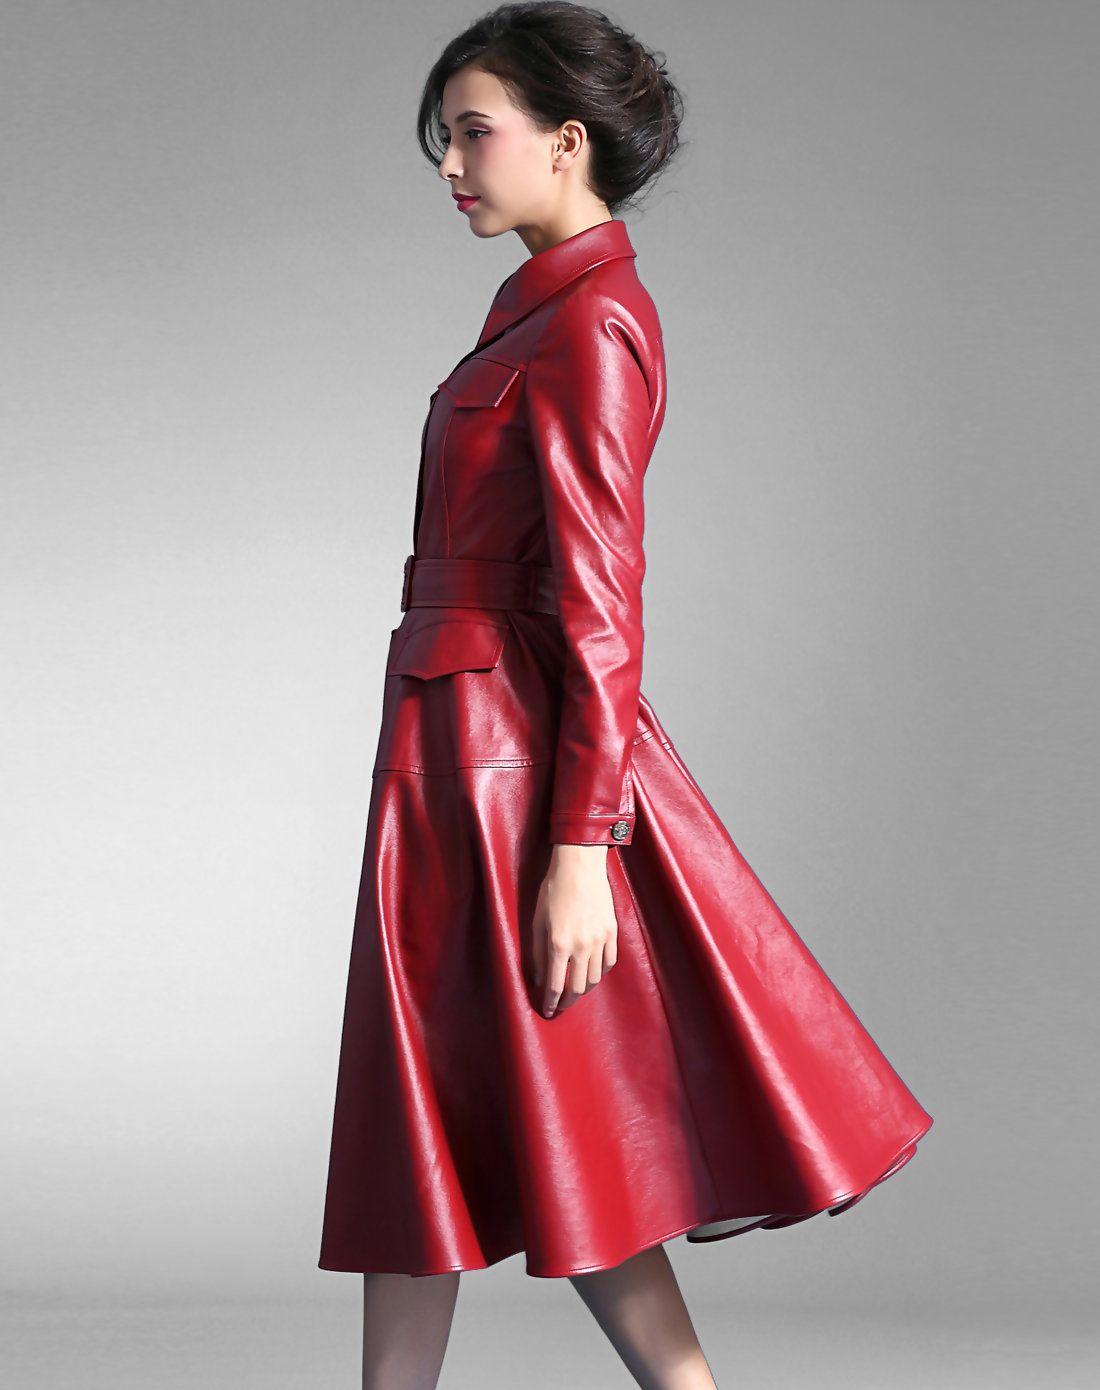 Wine PU Stand Collor Pleated Dress Coat, Red, BAOYAN - VIPme